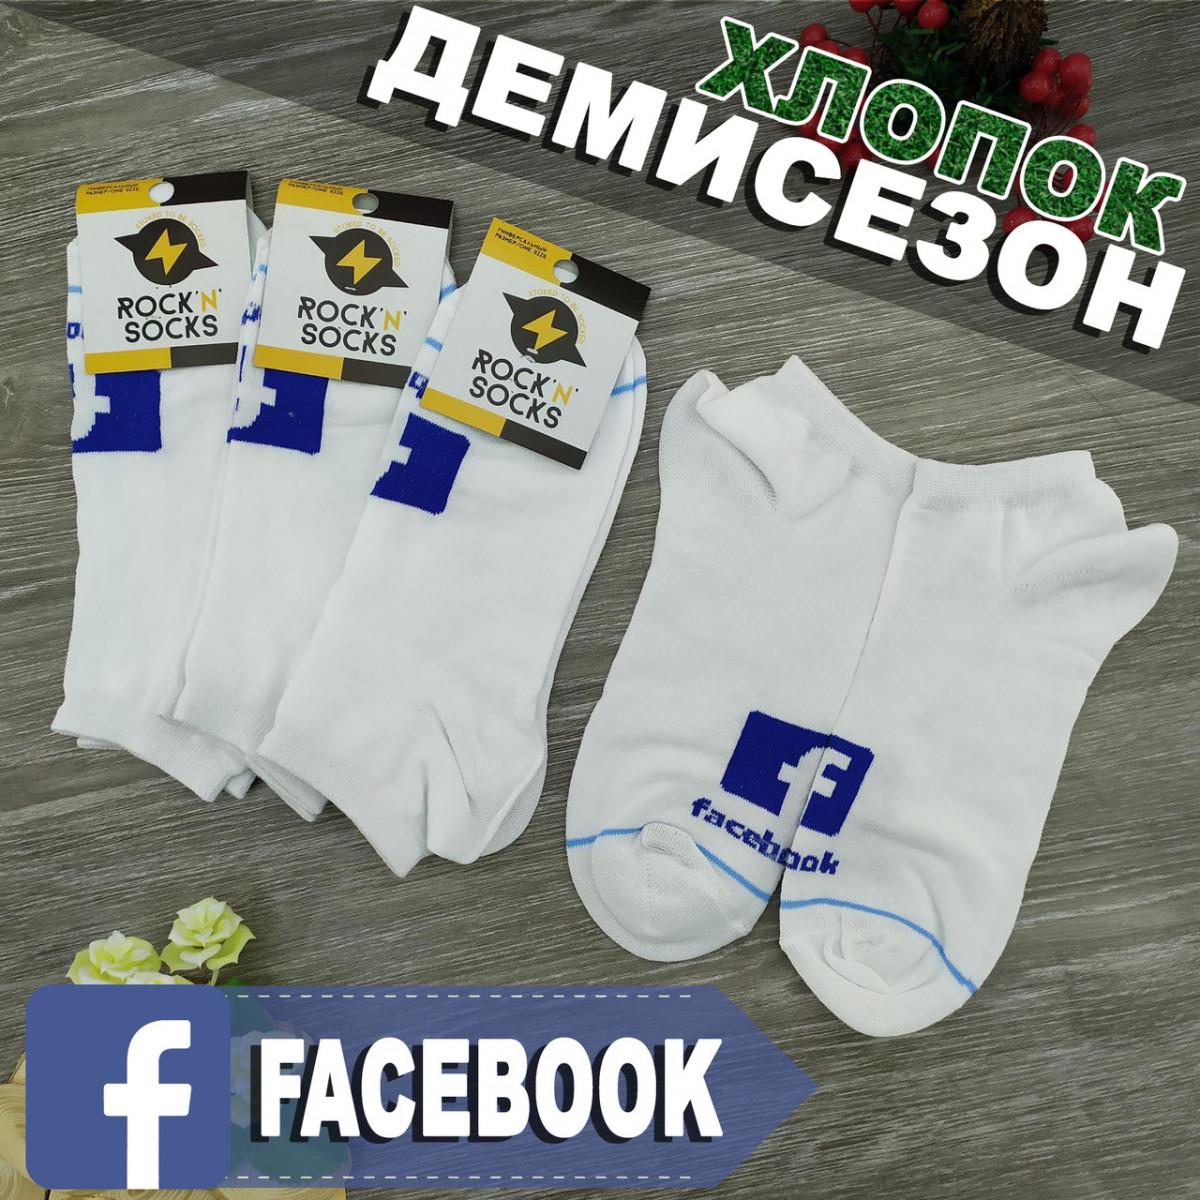 Носки с приколами демисезонные короткие Rock'n'socks 445-27 Украина one size (37-44р) 20033699